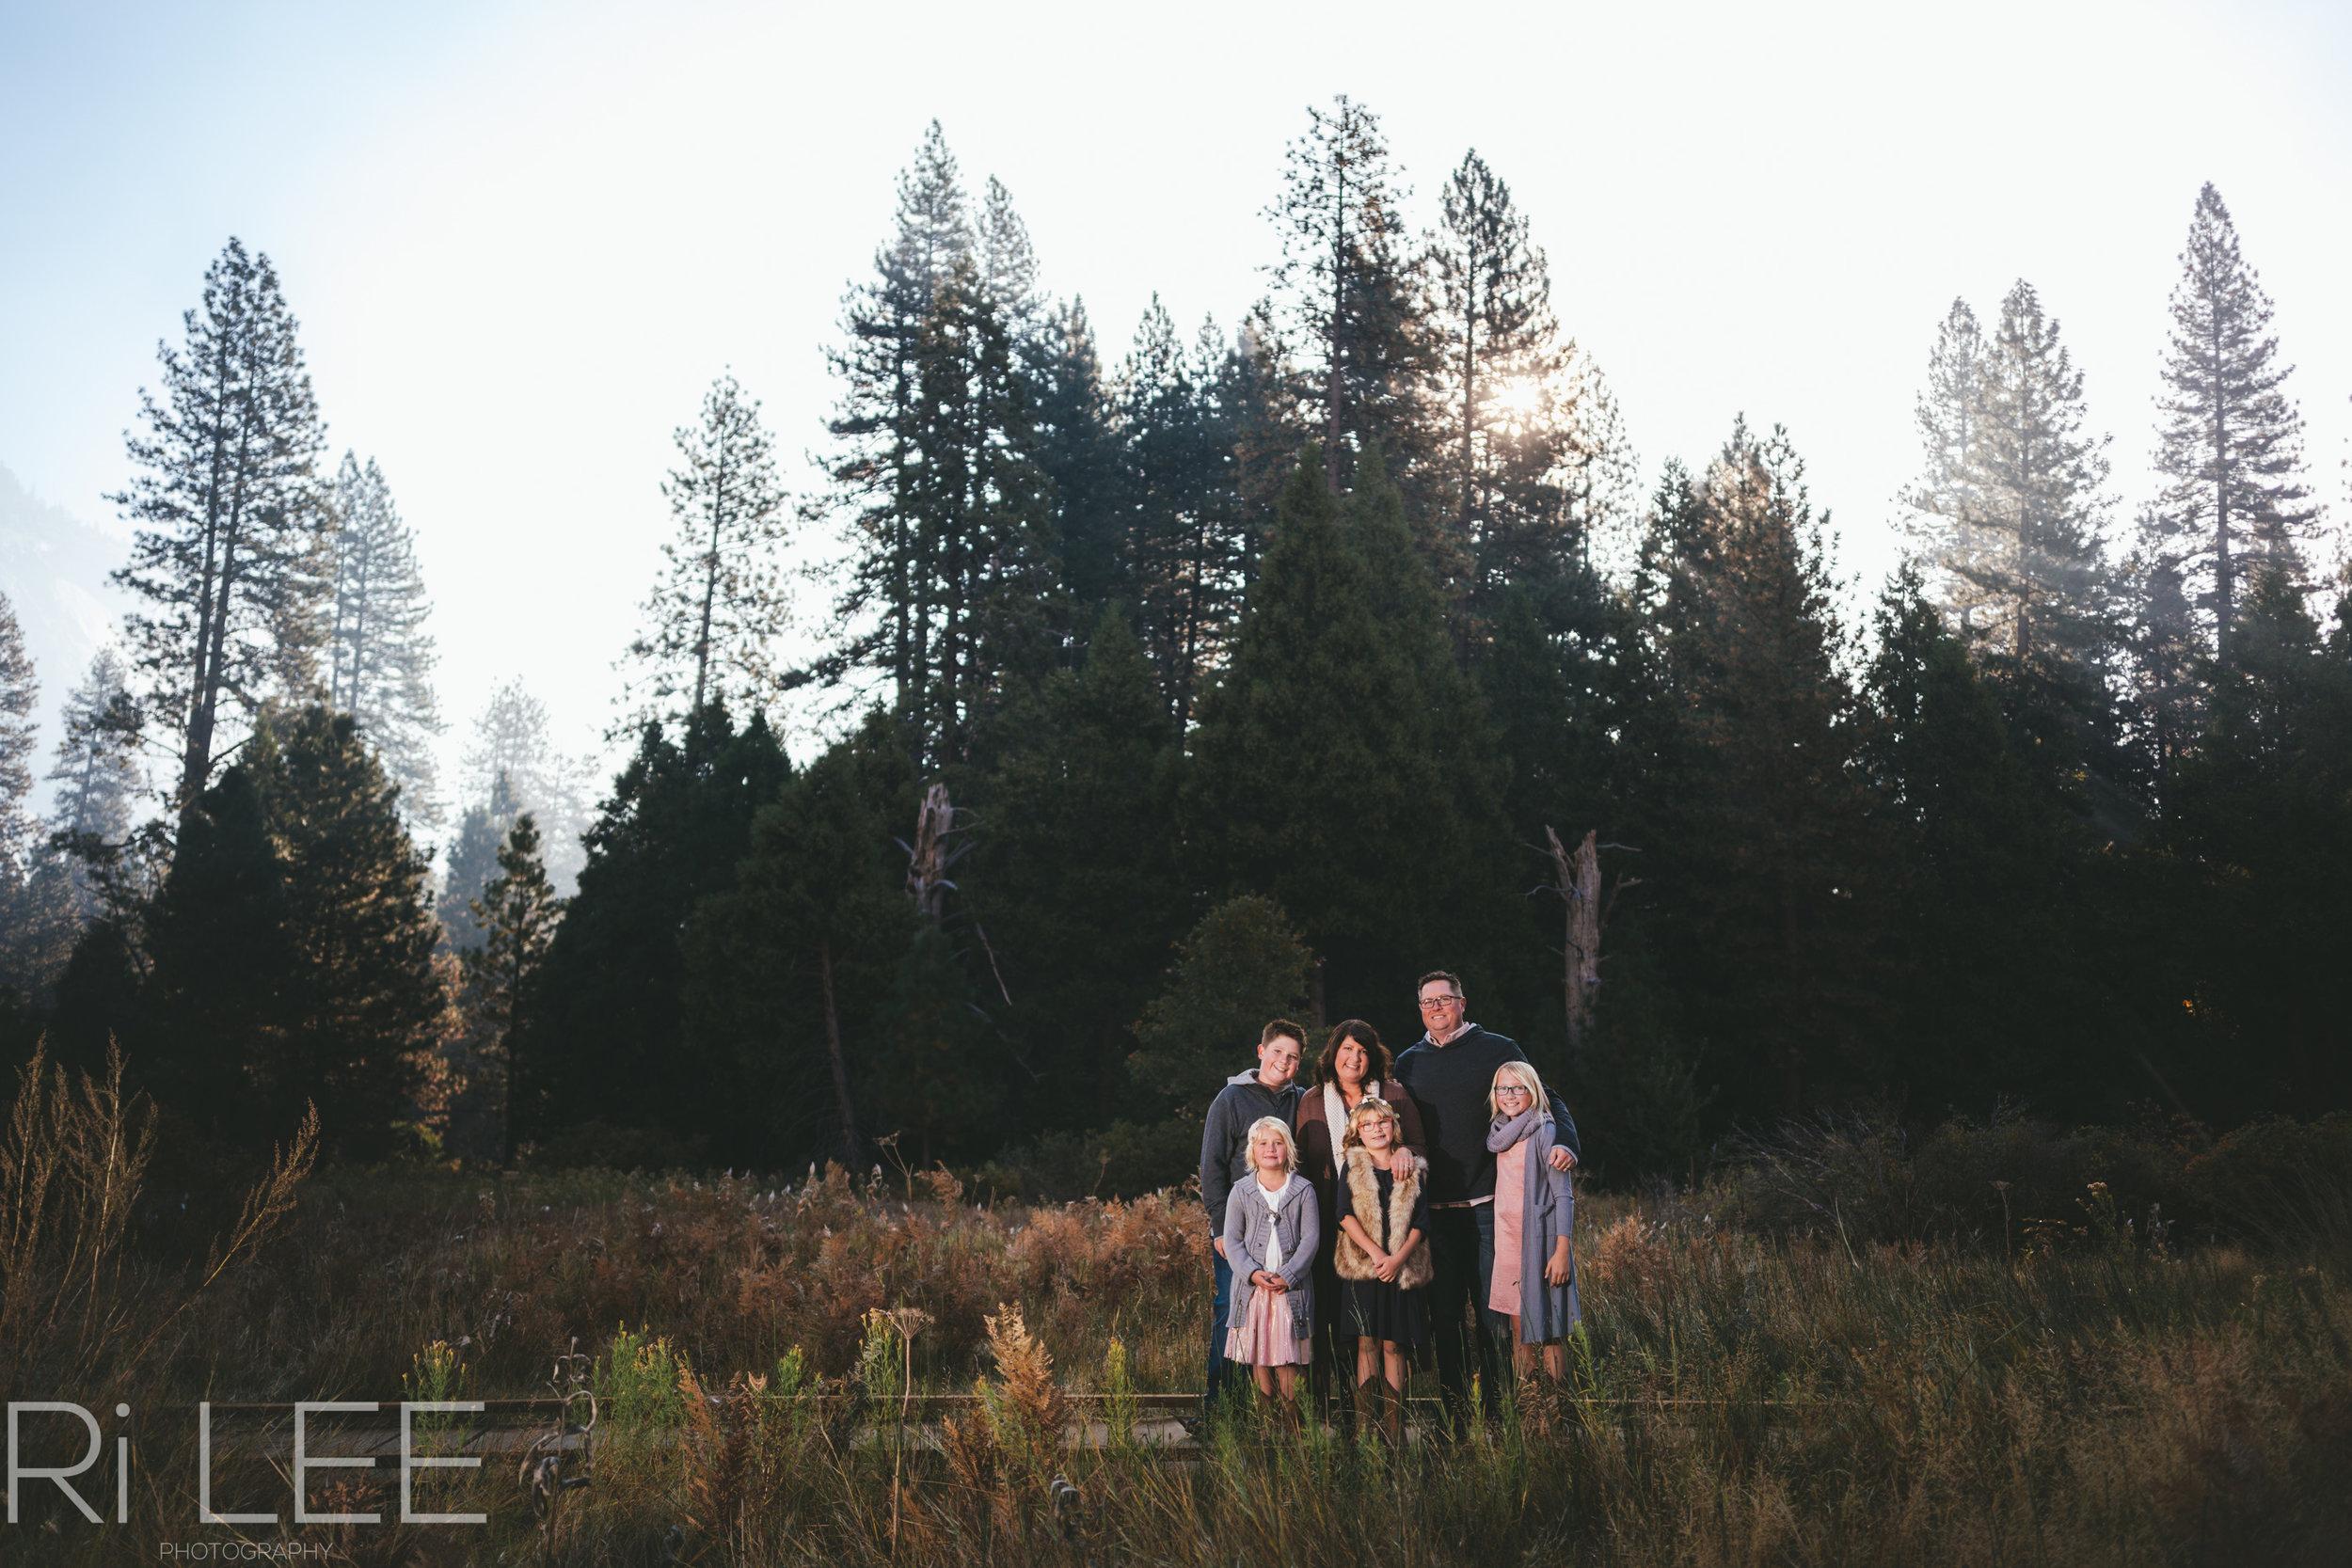 hunt-family-rilee-web (18 of 22).jpg